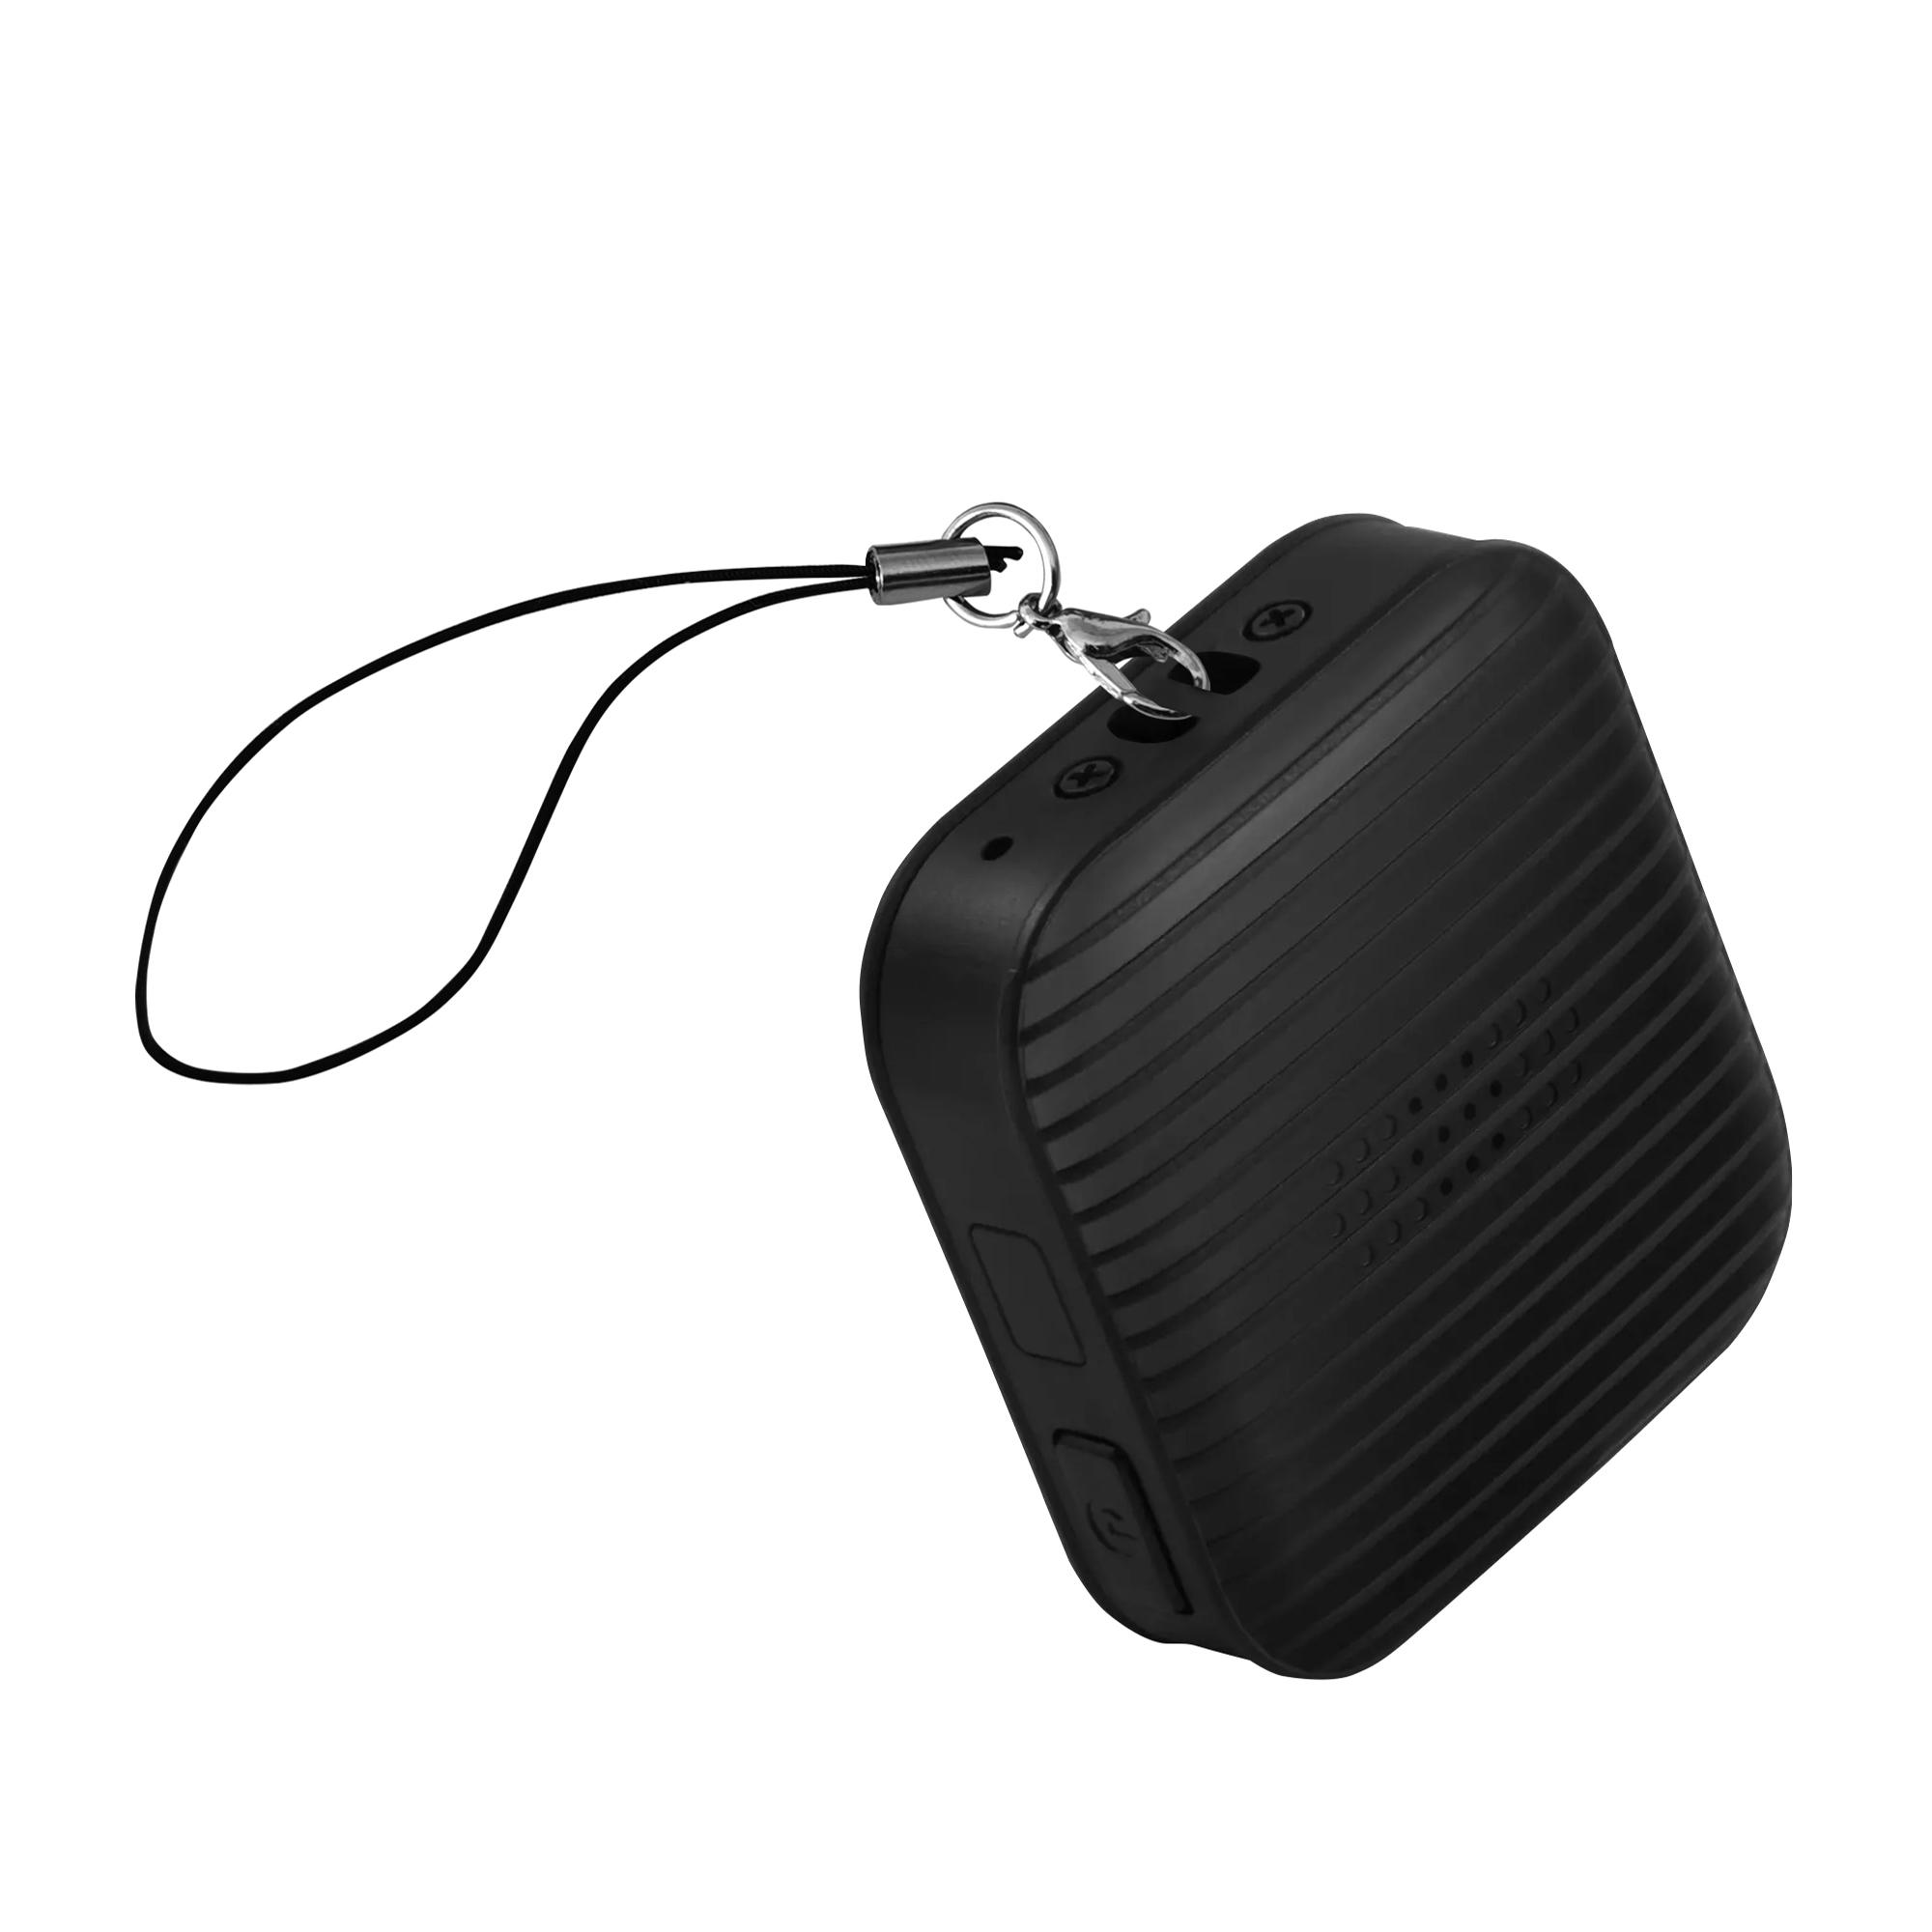 Mini GPS Tracker i365-Tech A18, Negru, Functie Localizare GPS, Istoric traseu, Apel SOS, Perimetru siguranta imagine